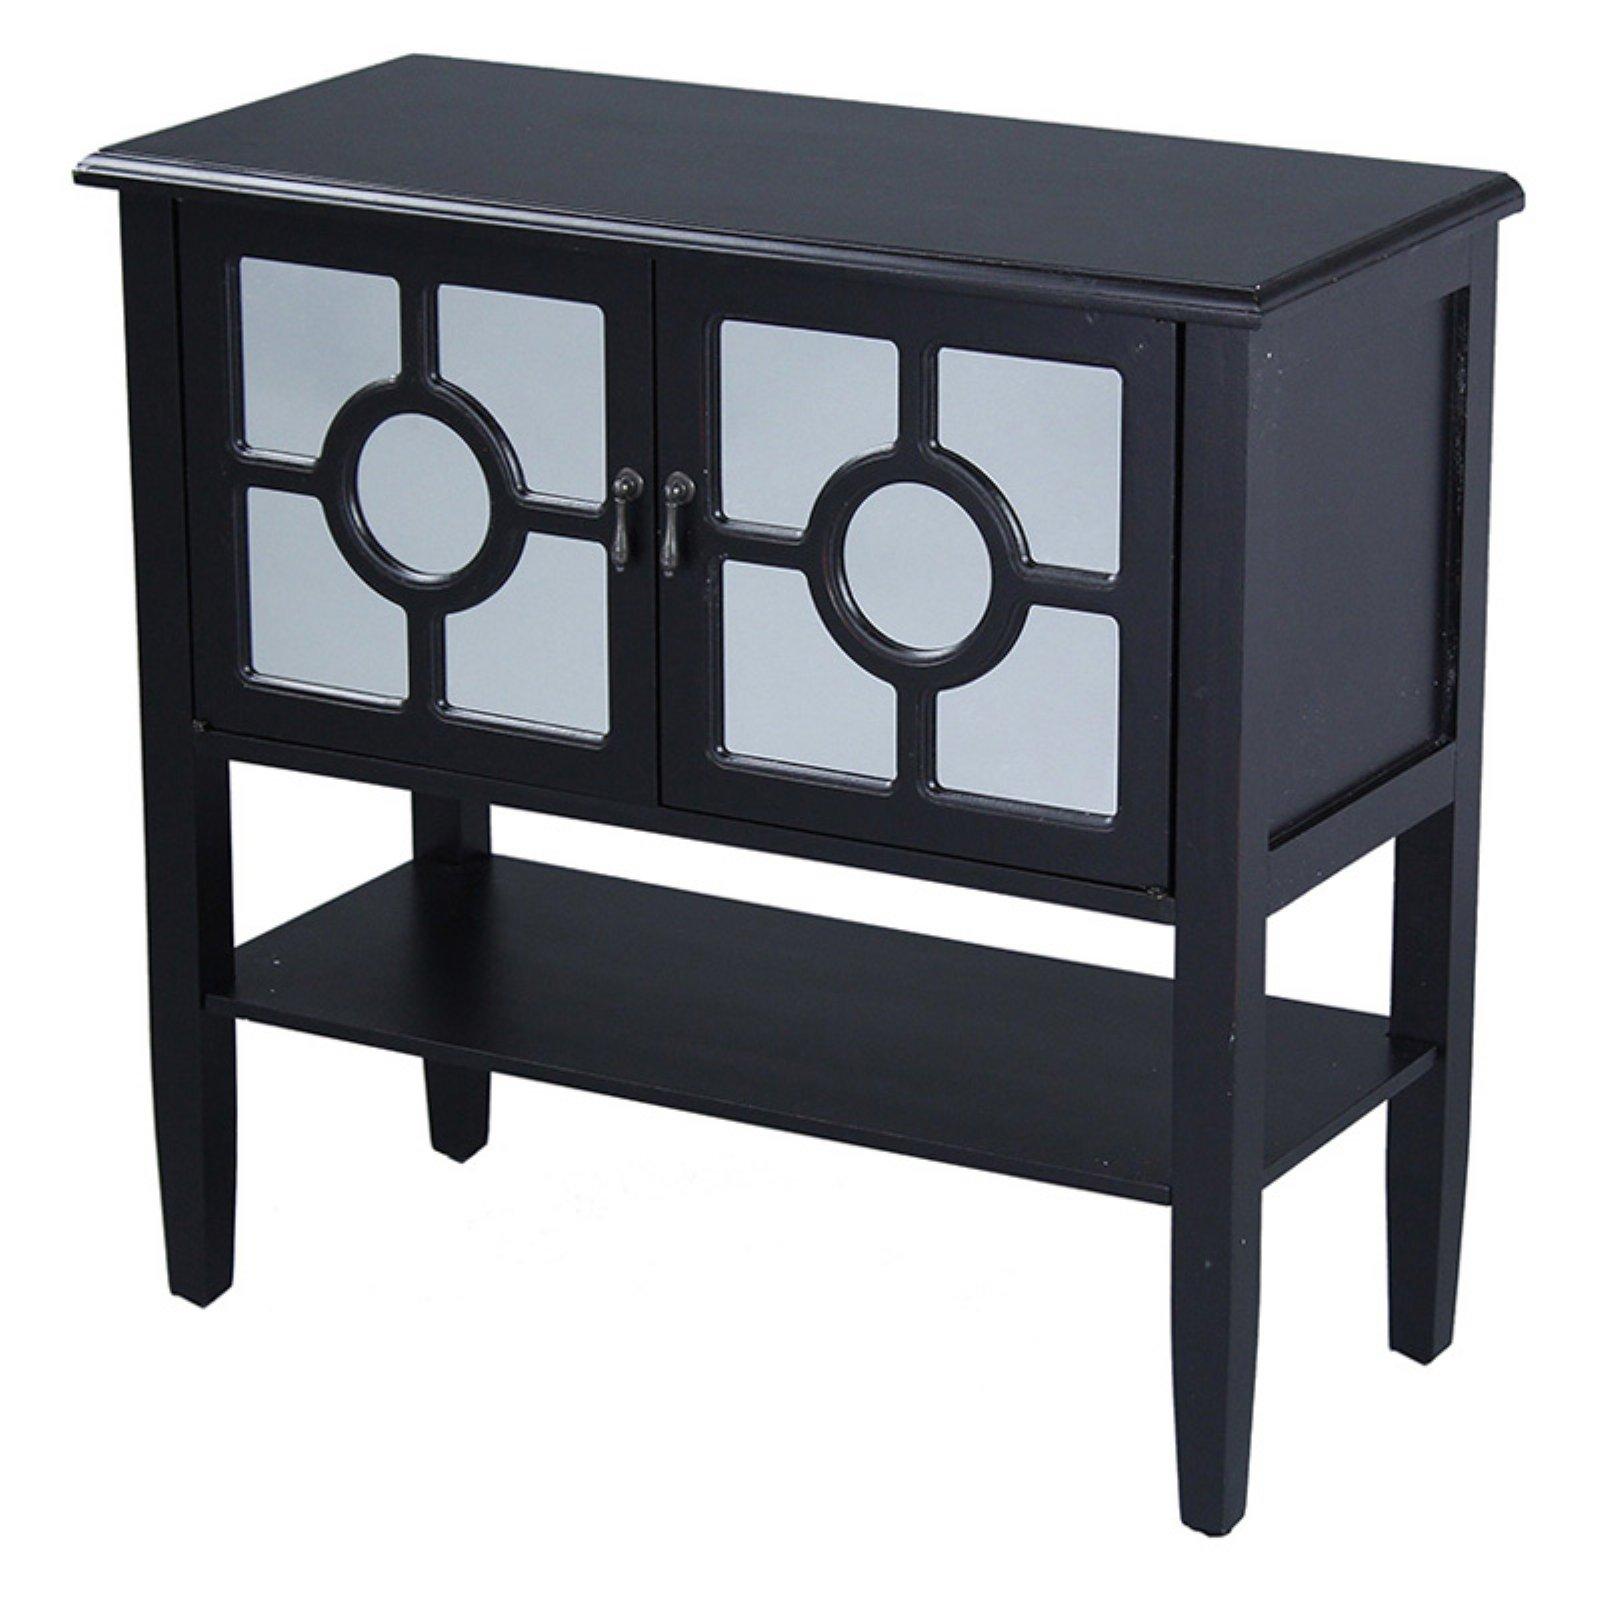 Heather Ann Creations Hampton Lattice Mirror Console Cabinet